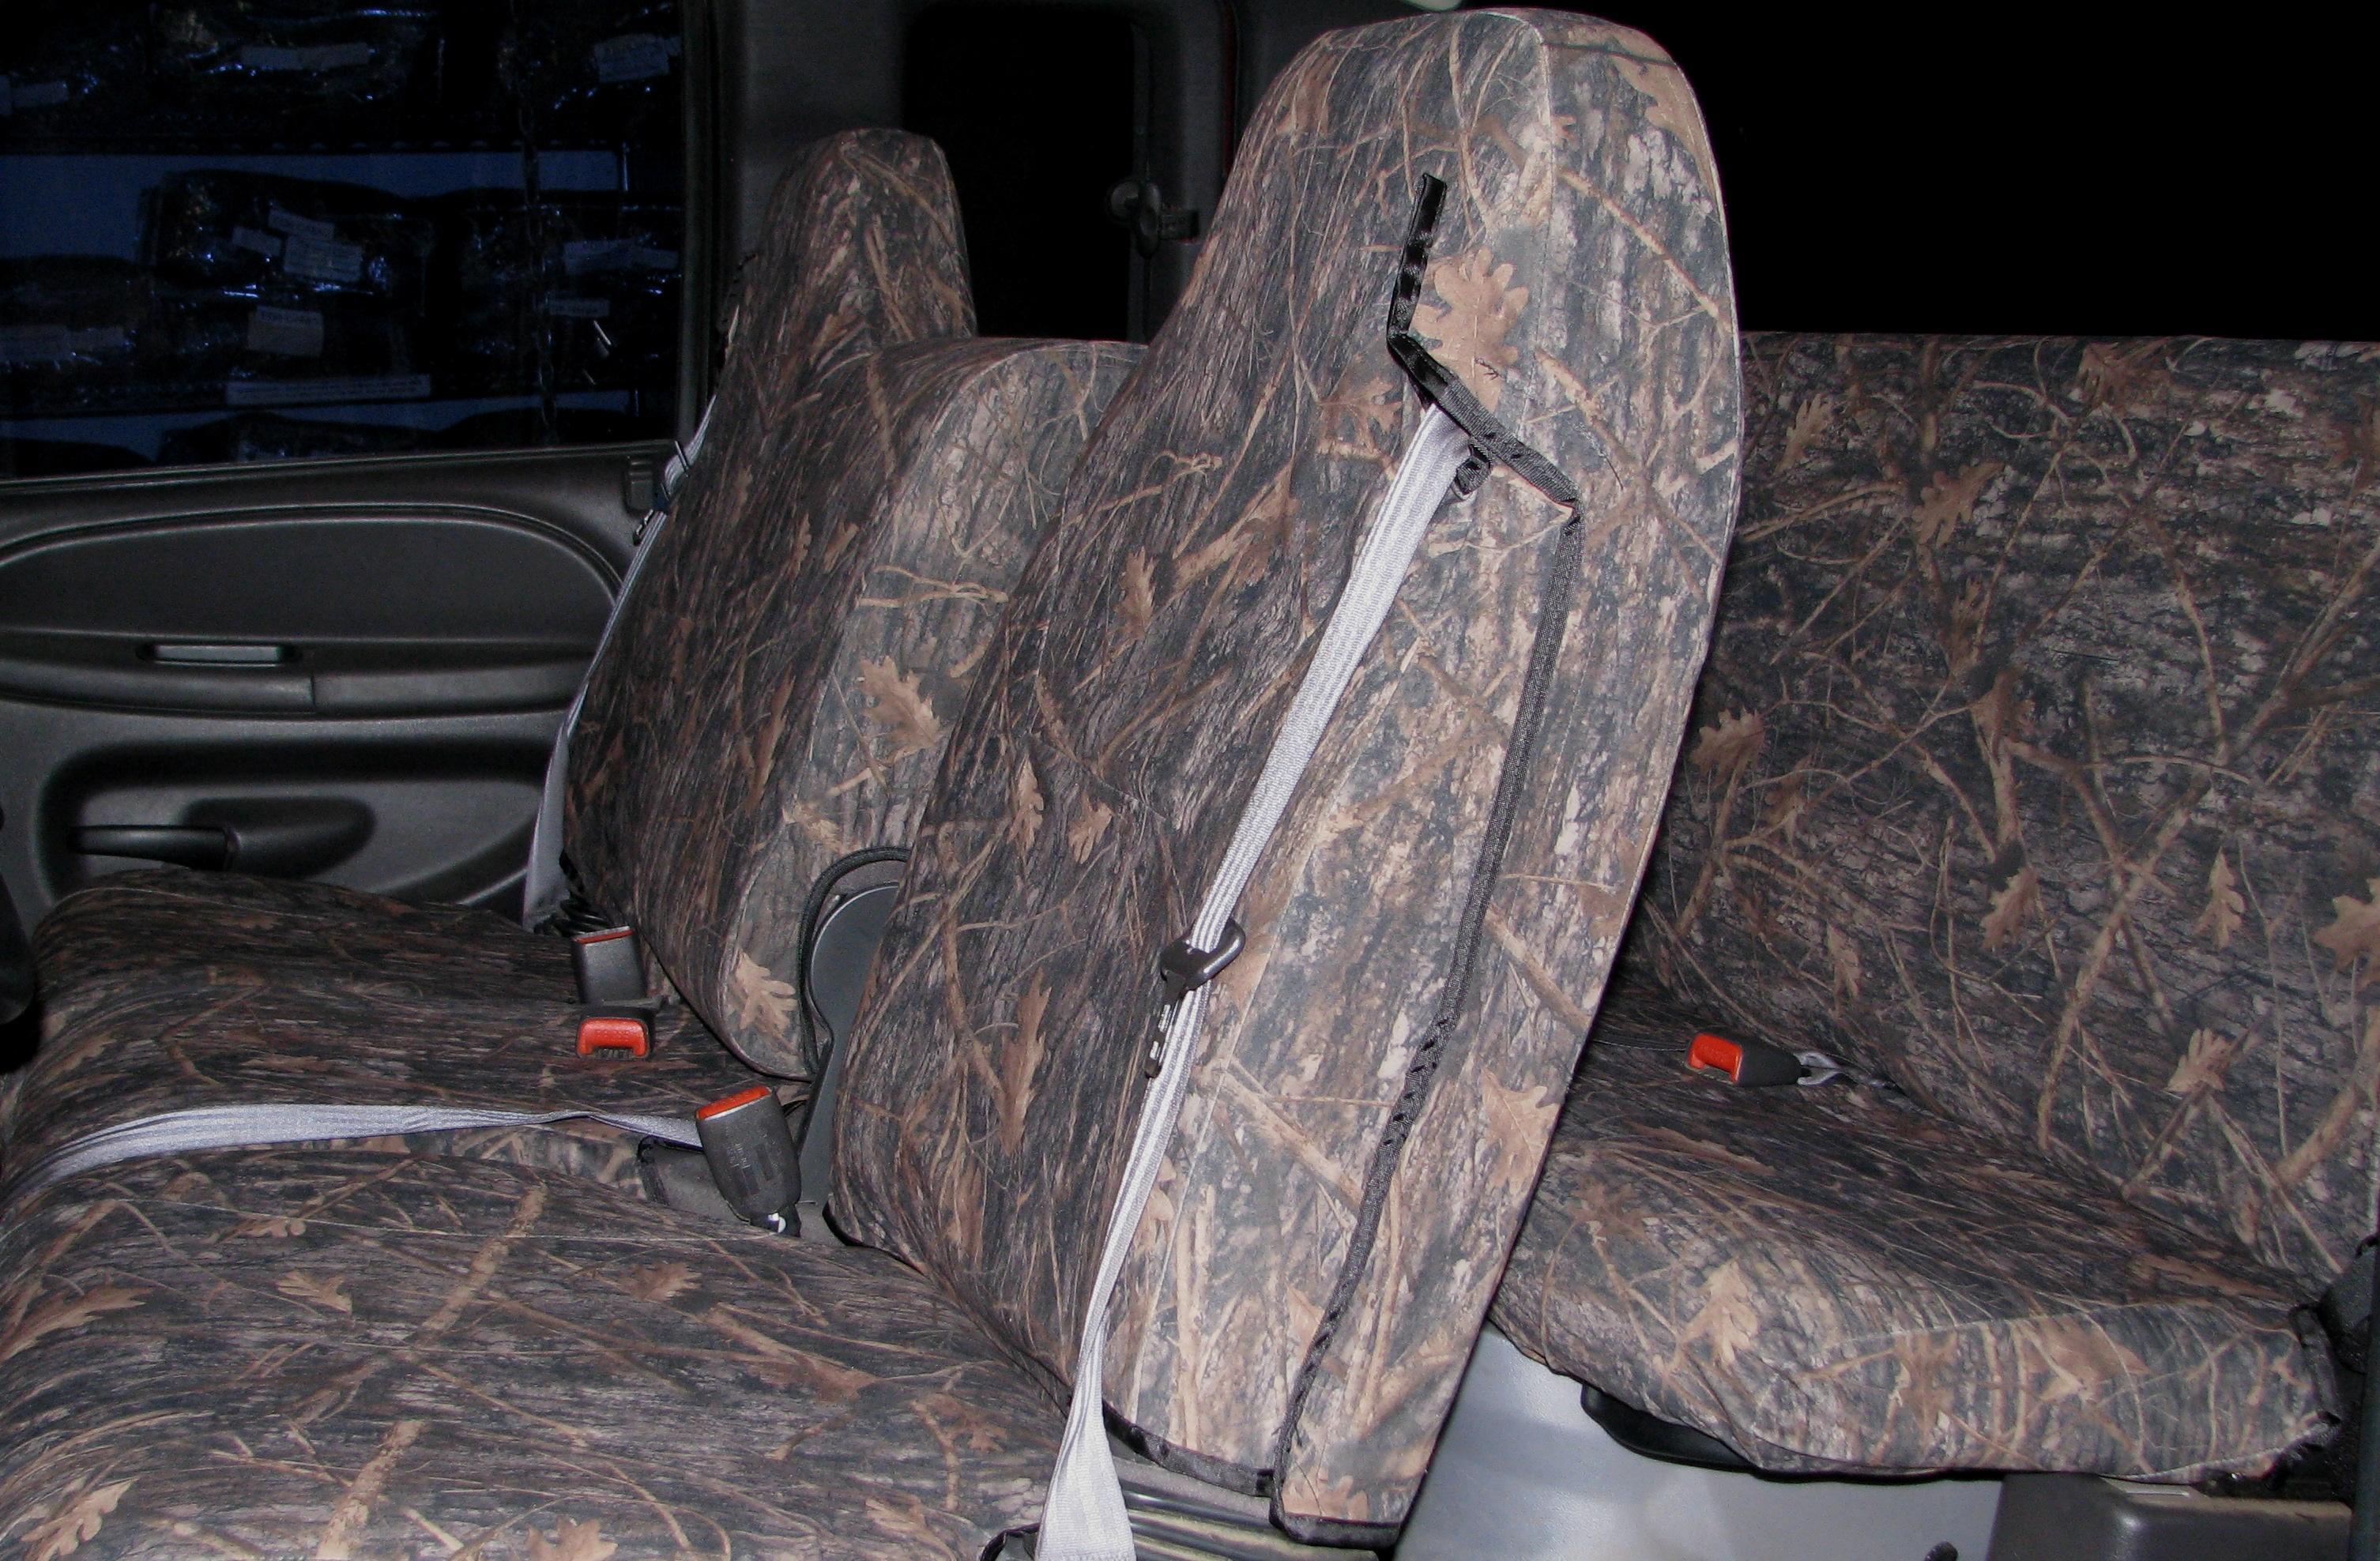 2001 dodge ram 2500 seat covers. Black Bedroom Furniture Sets. Home Design Ideas